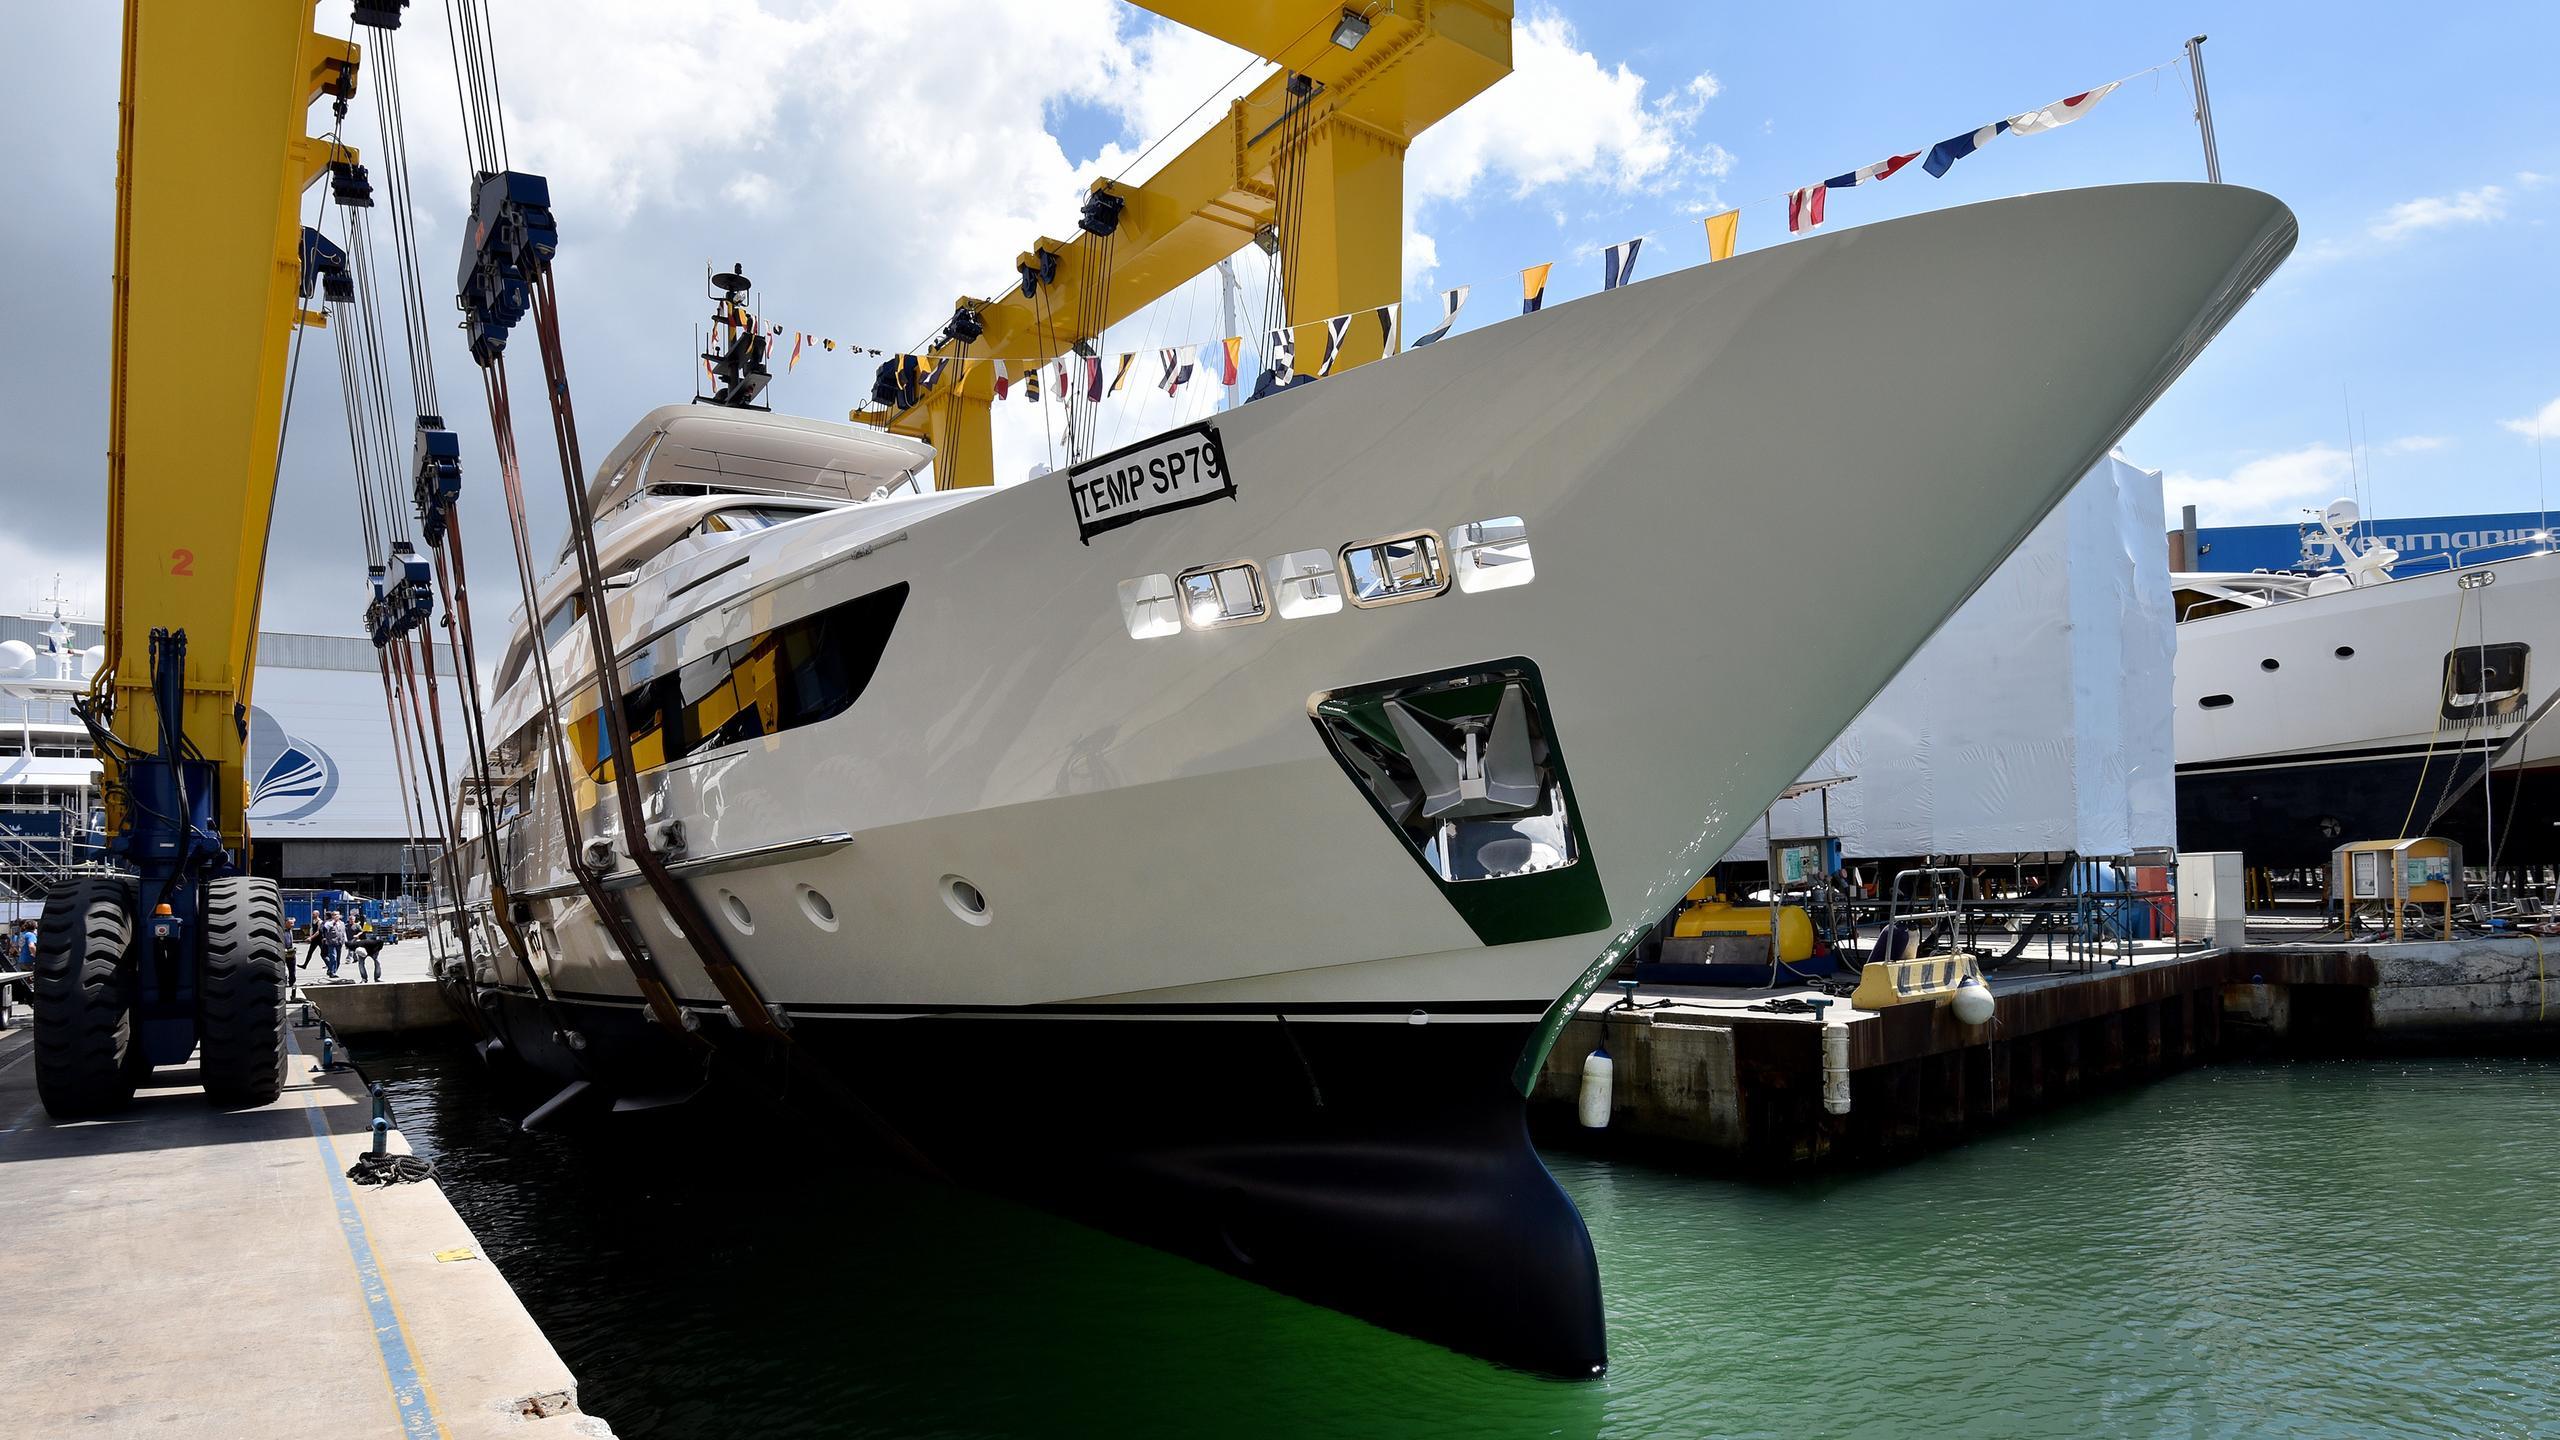 sim sim motoryacht sanlorenzo sd126 38m 2017 launch half profile